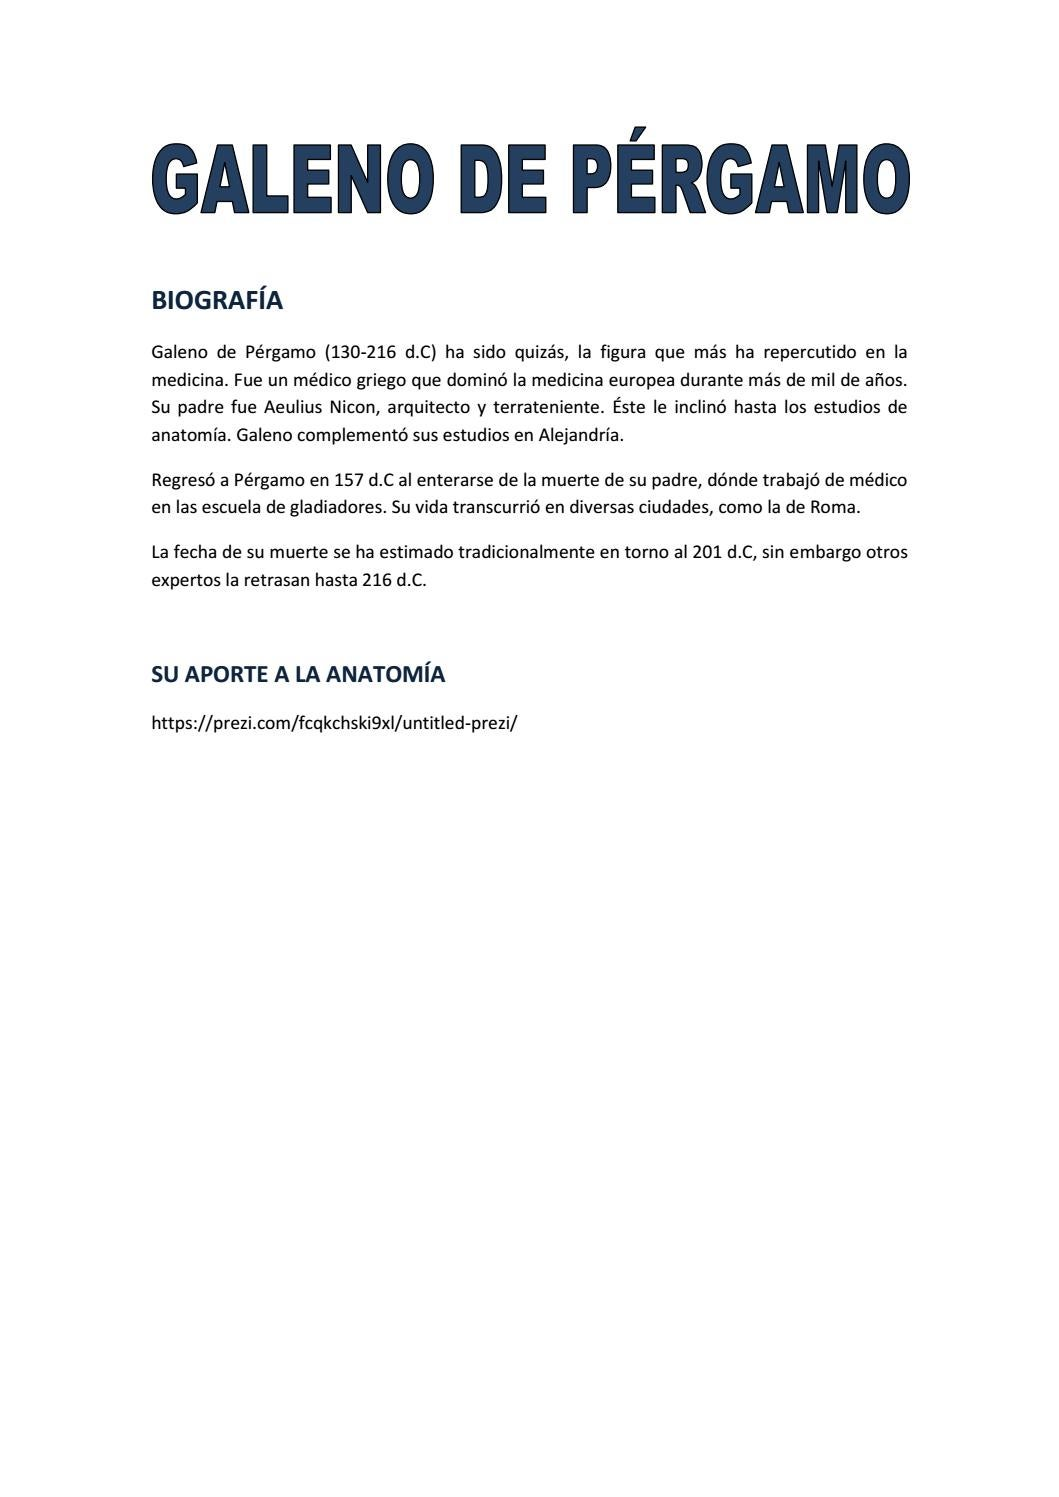 Diario de anatomía by Ángel Valverde - issuu